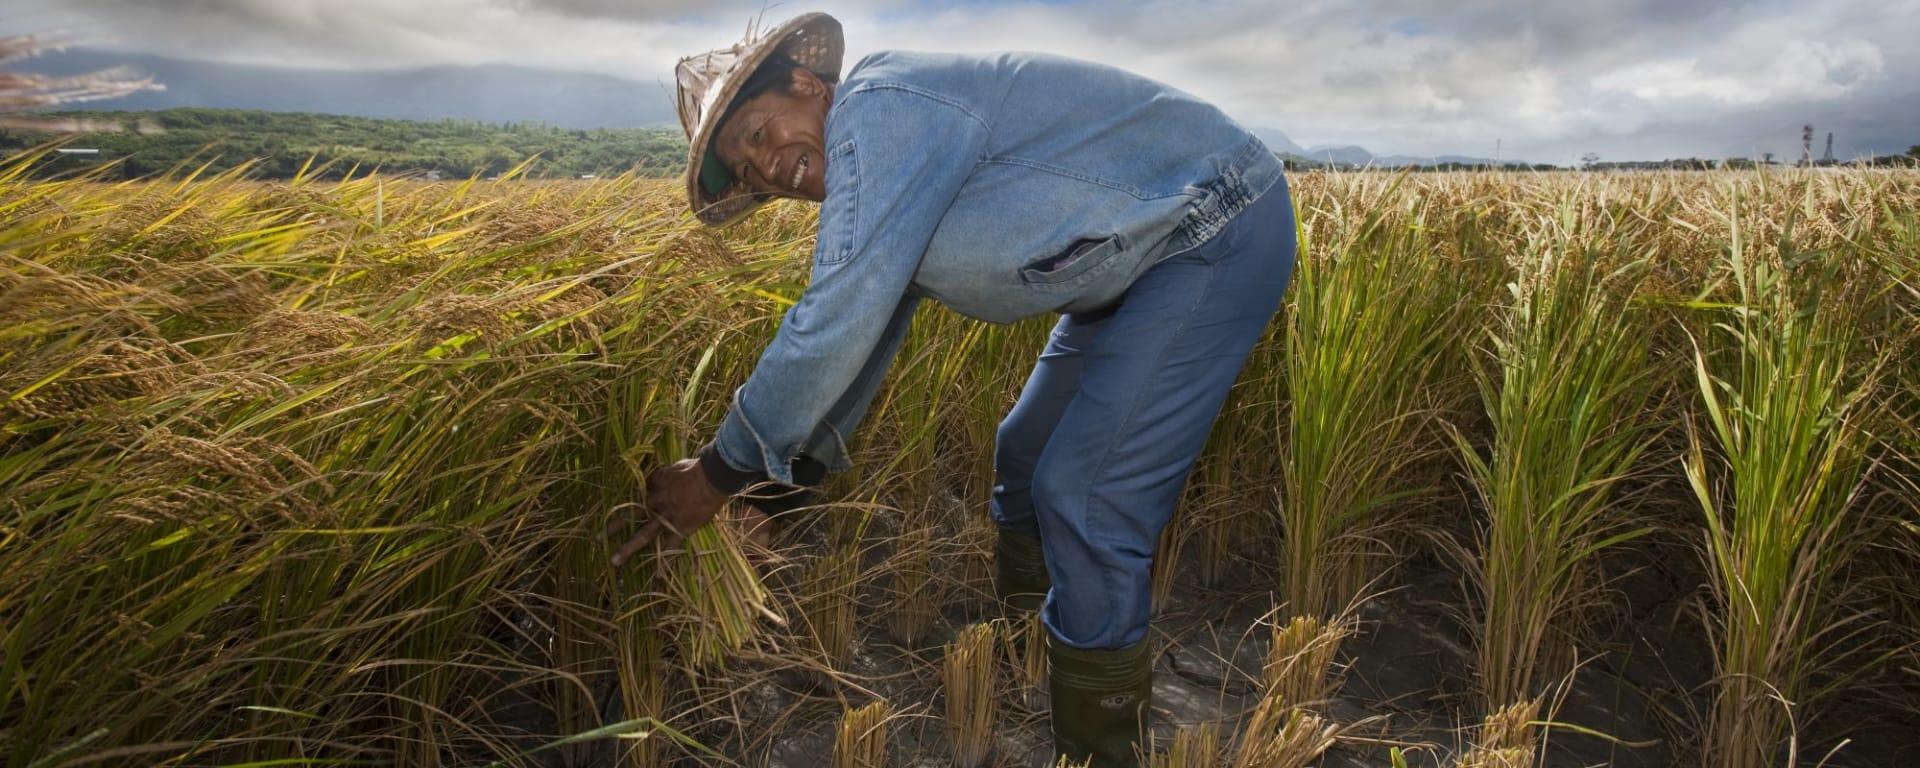 Voyages en Taïwan | Vacances en Asie par tourasia: Rice farmer on work